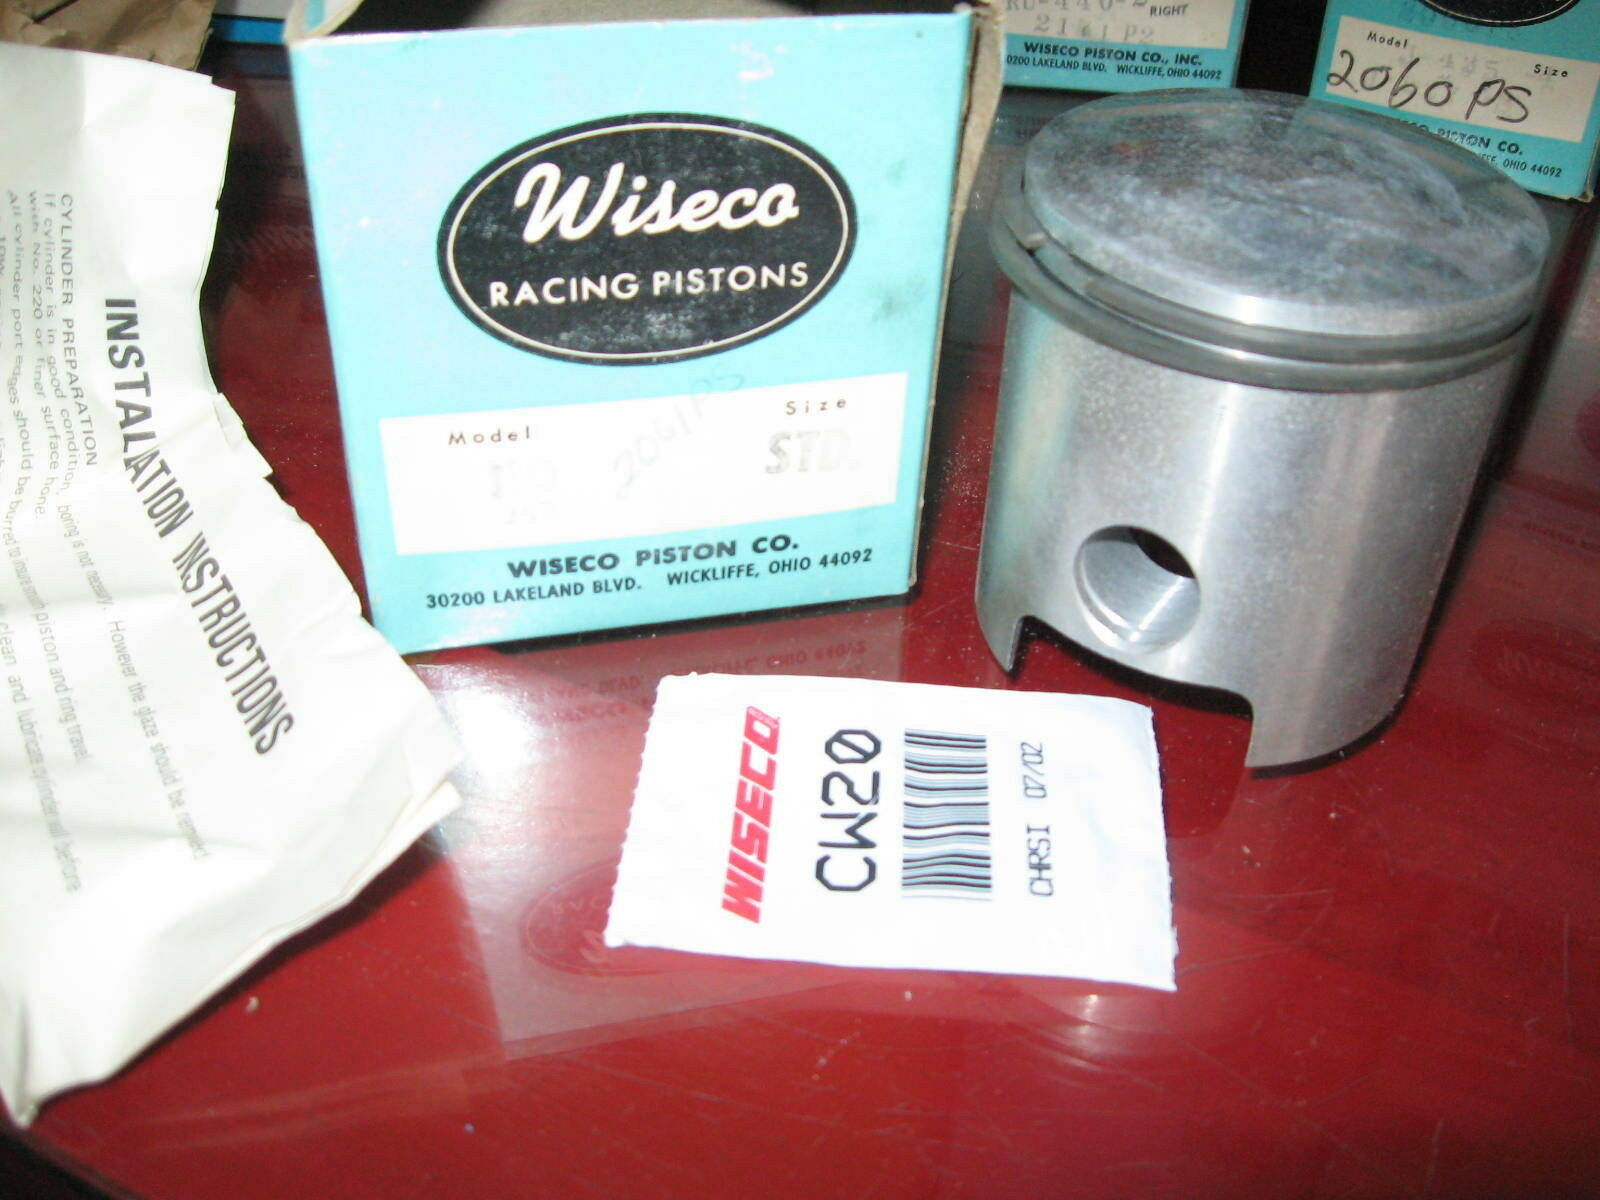 1967  1968 1969 JLO L292 Wiseco Piston Kit_2mm os_Arctic Cat_Fox Trac_Ski-Daddler  online